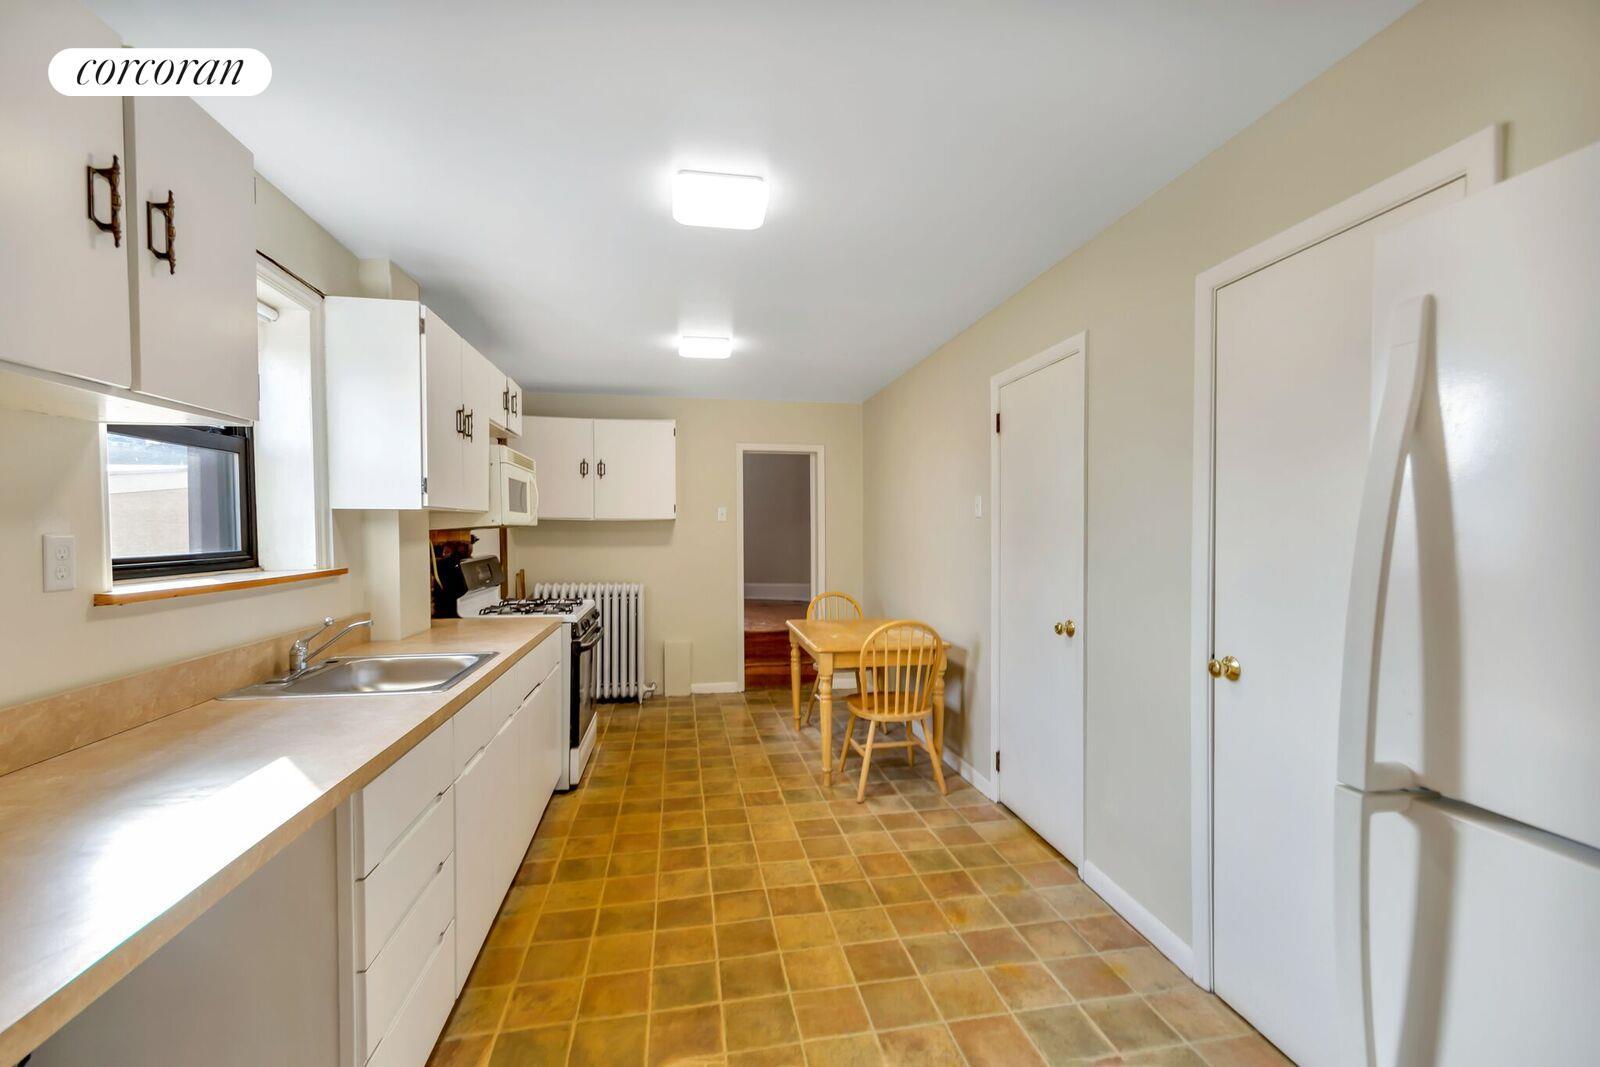 Corcoran, 51 Saint Pauls Avenue, Tompkinsville Real Estate, Staten ...